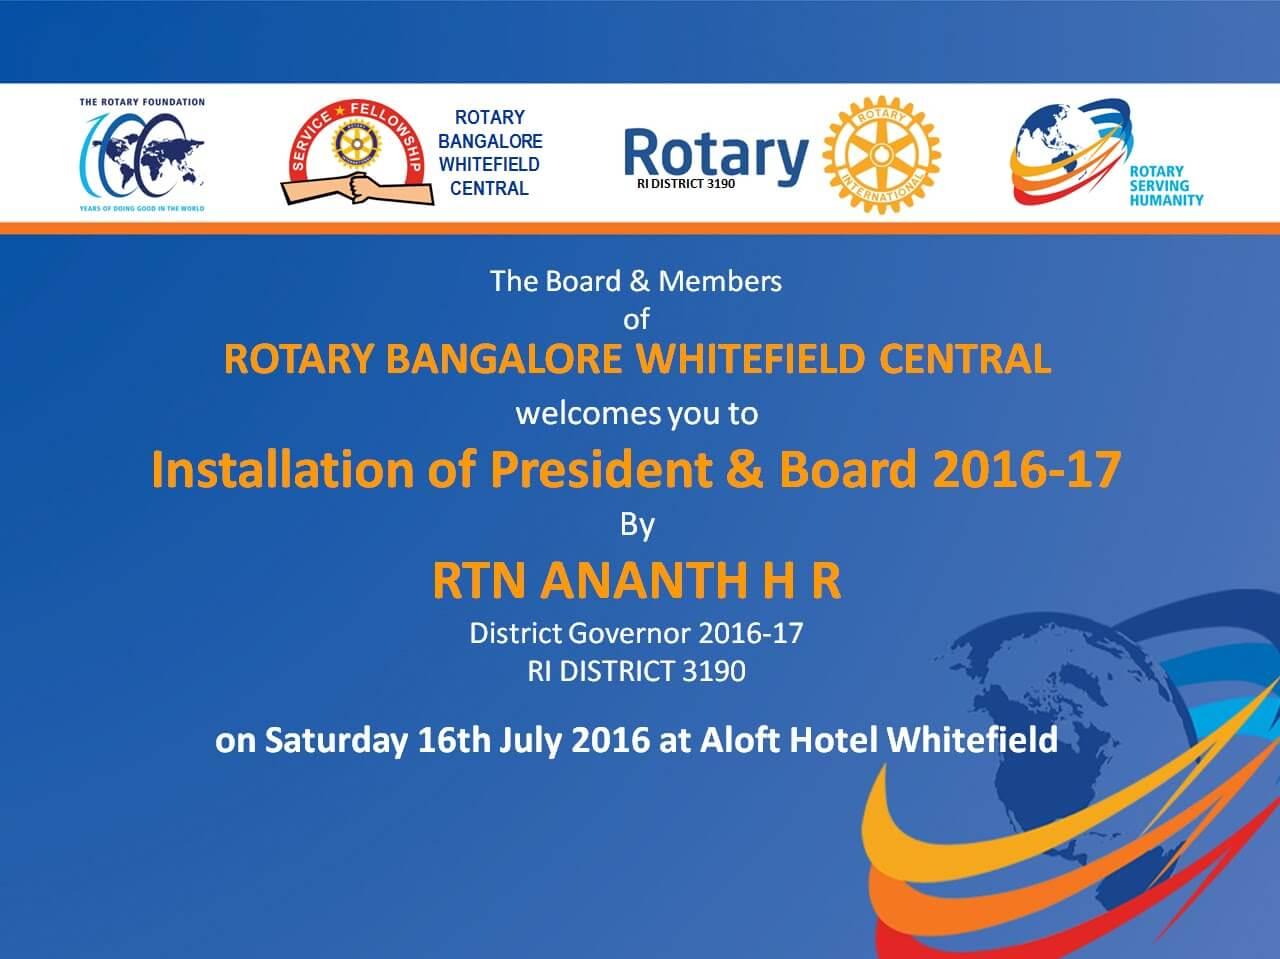 Installation of New Board 2016-17